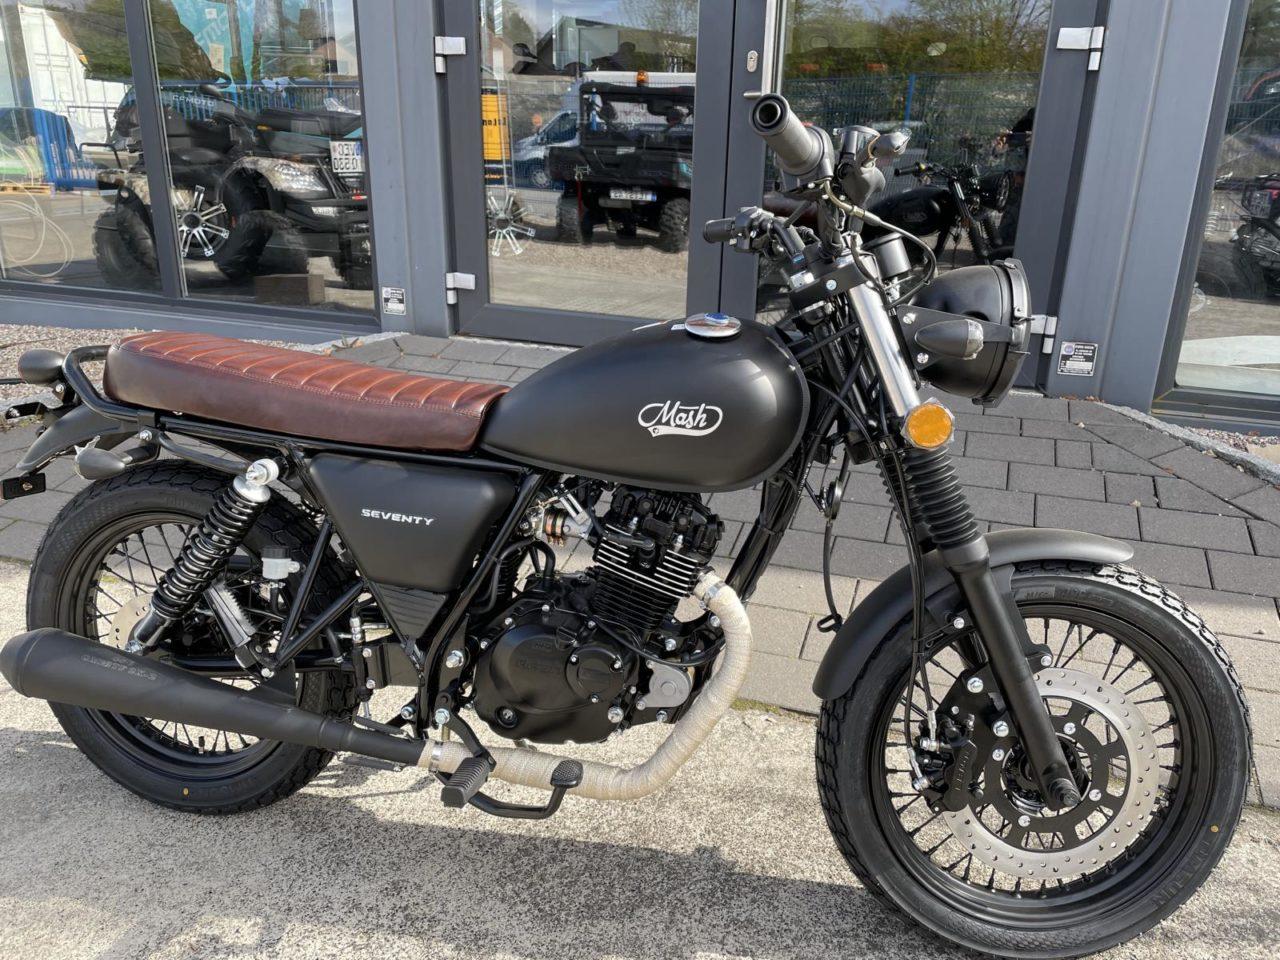 Motorrad, Moped, Mash 125 ccm Modell Seventy, Euro 5